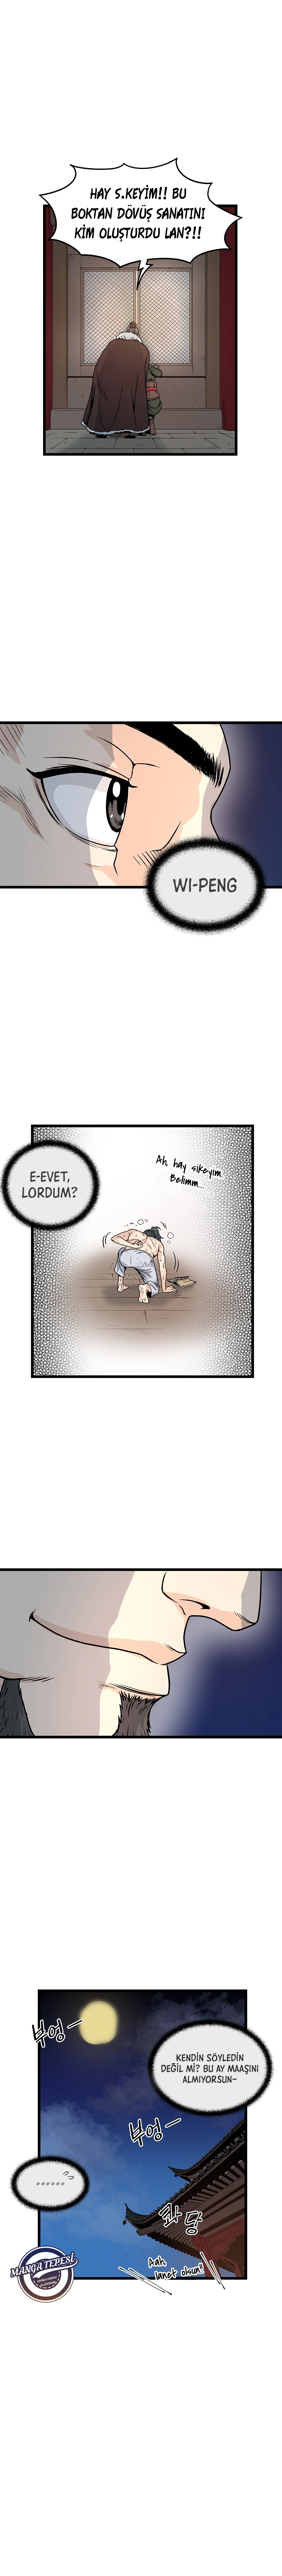 murim-loginbolum-8